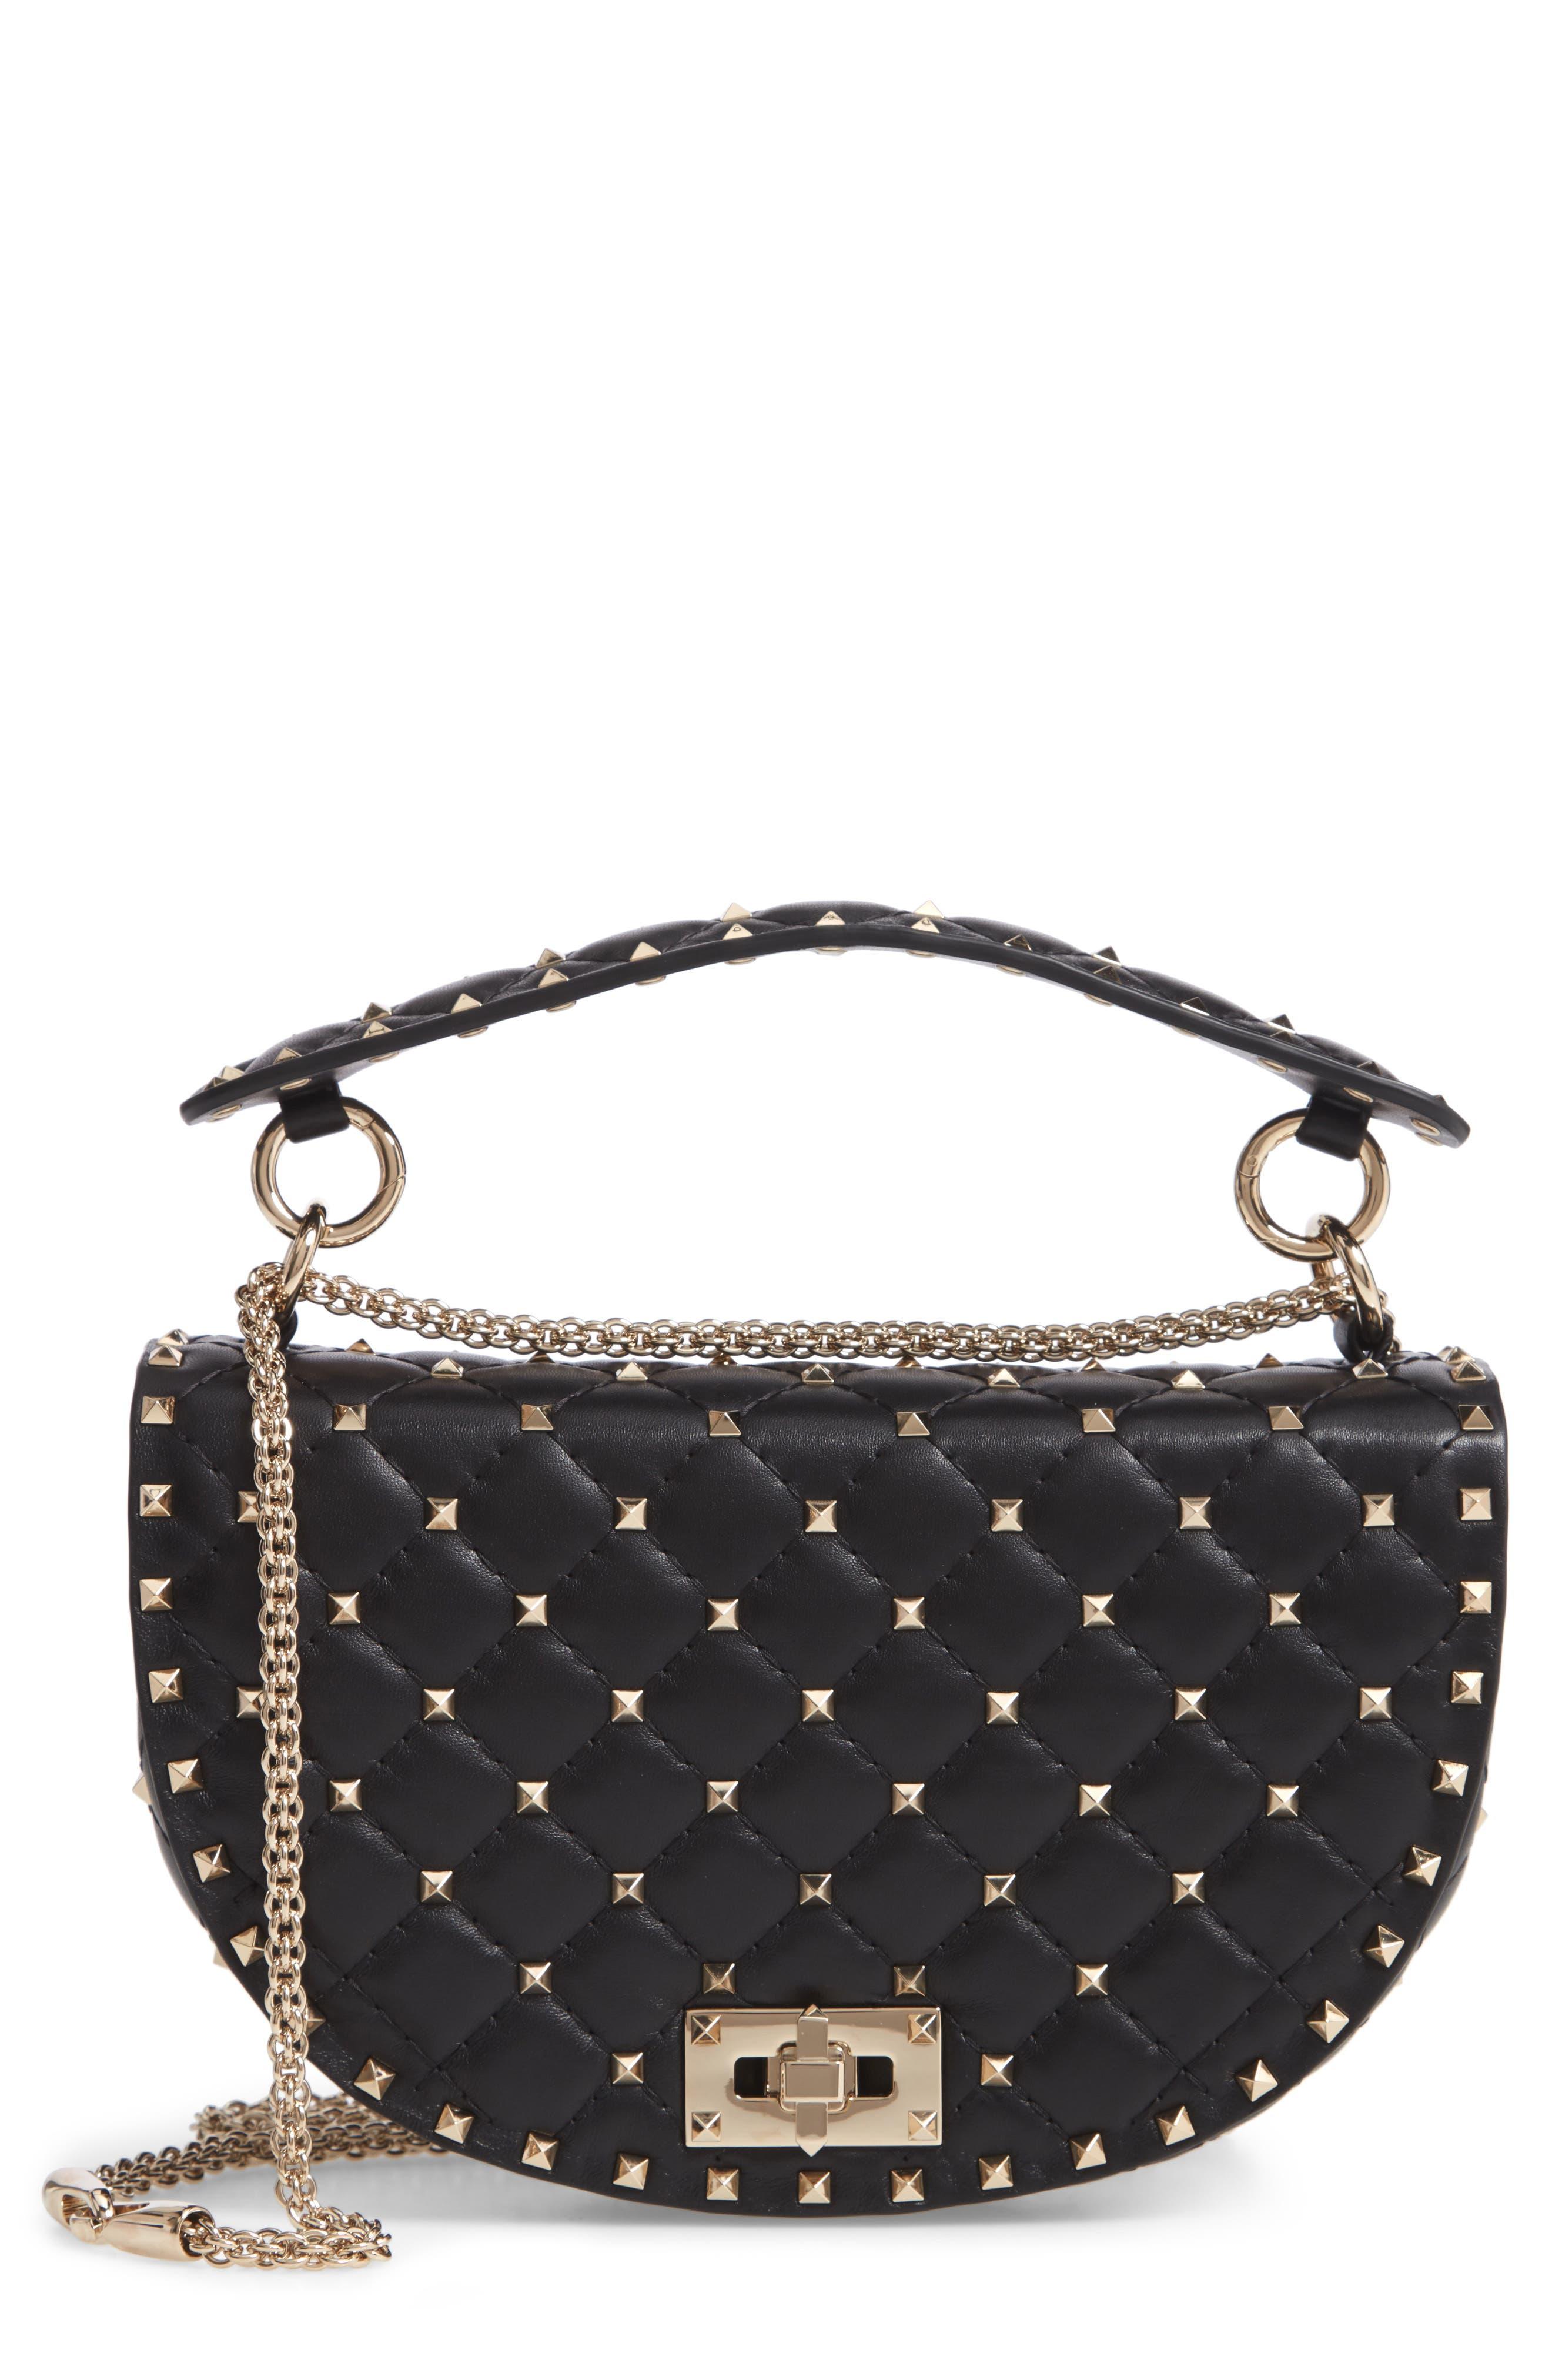 VALENTINO GARAVANI Rockstud Spike Leather Saddle Bag, Main, color, NERO